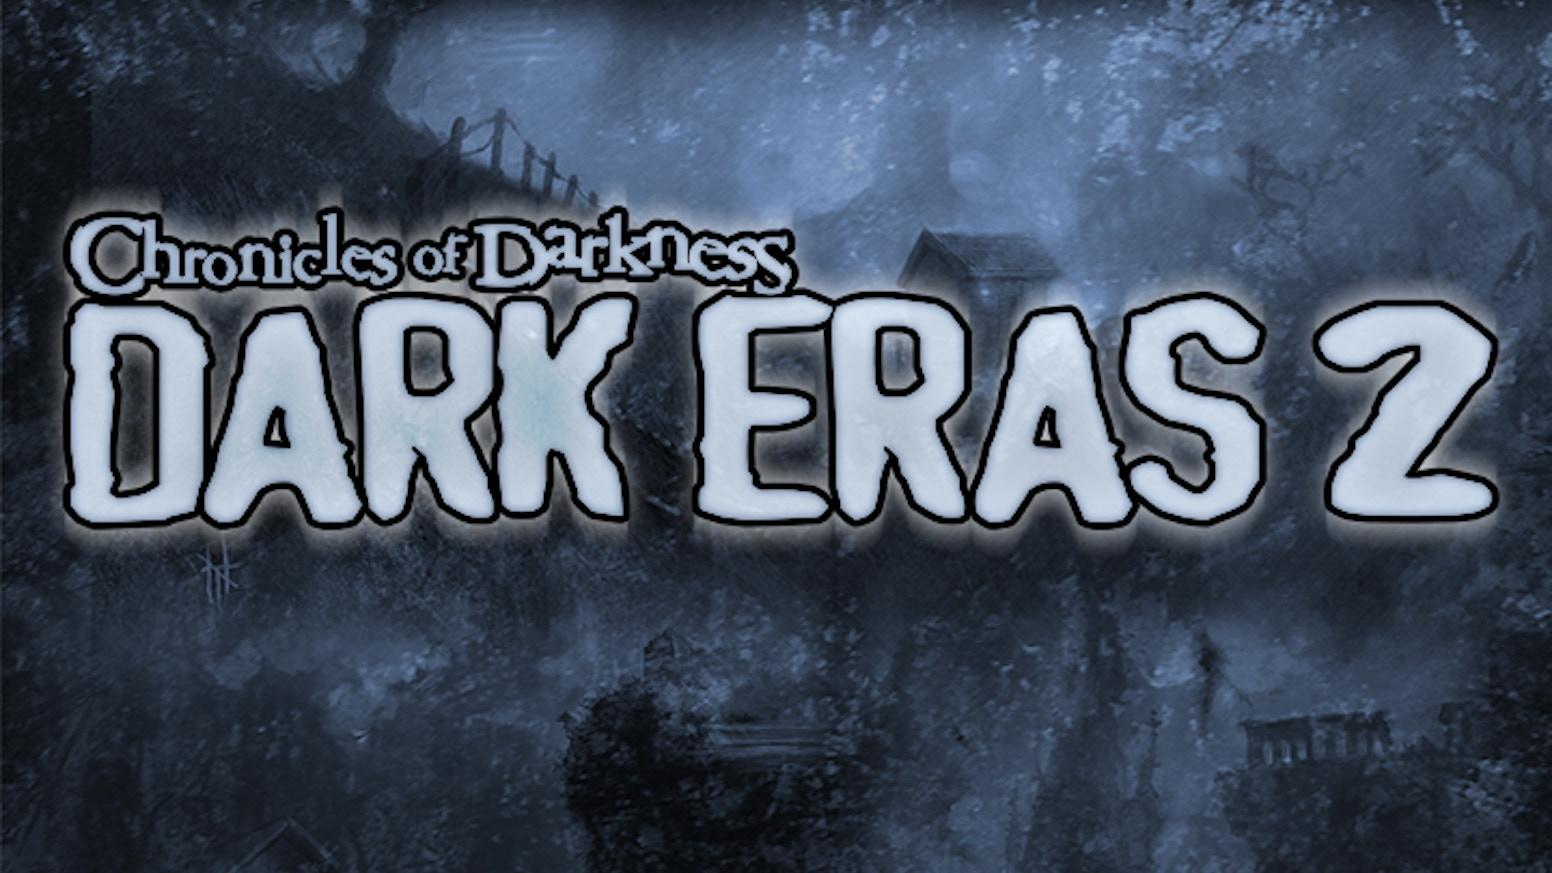 Even if you missed the Kickstarter, you can still pre-order Dark Eras 2 here: